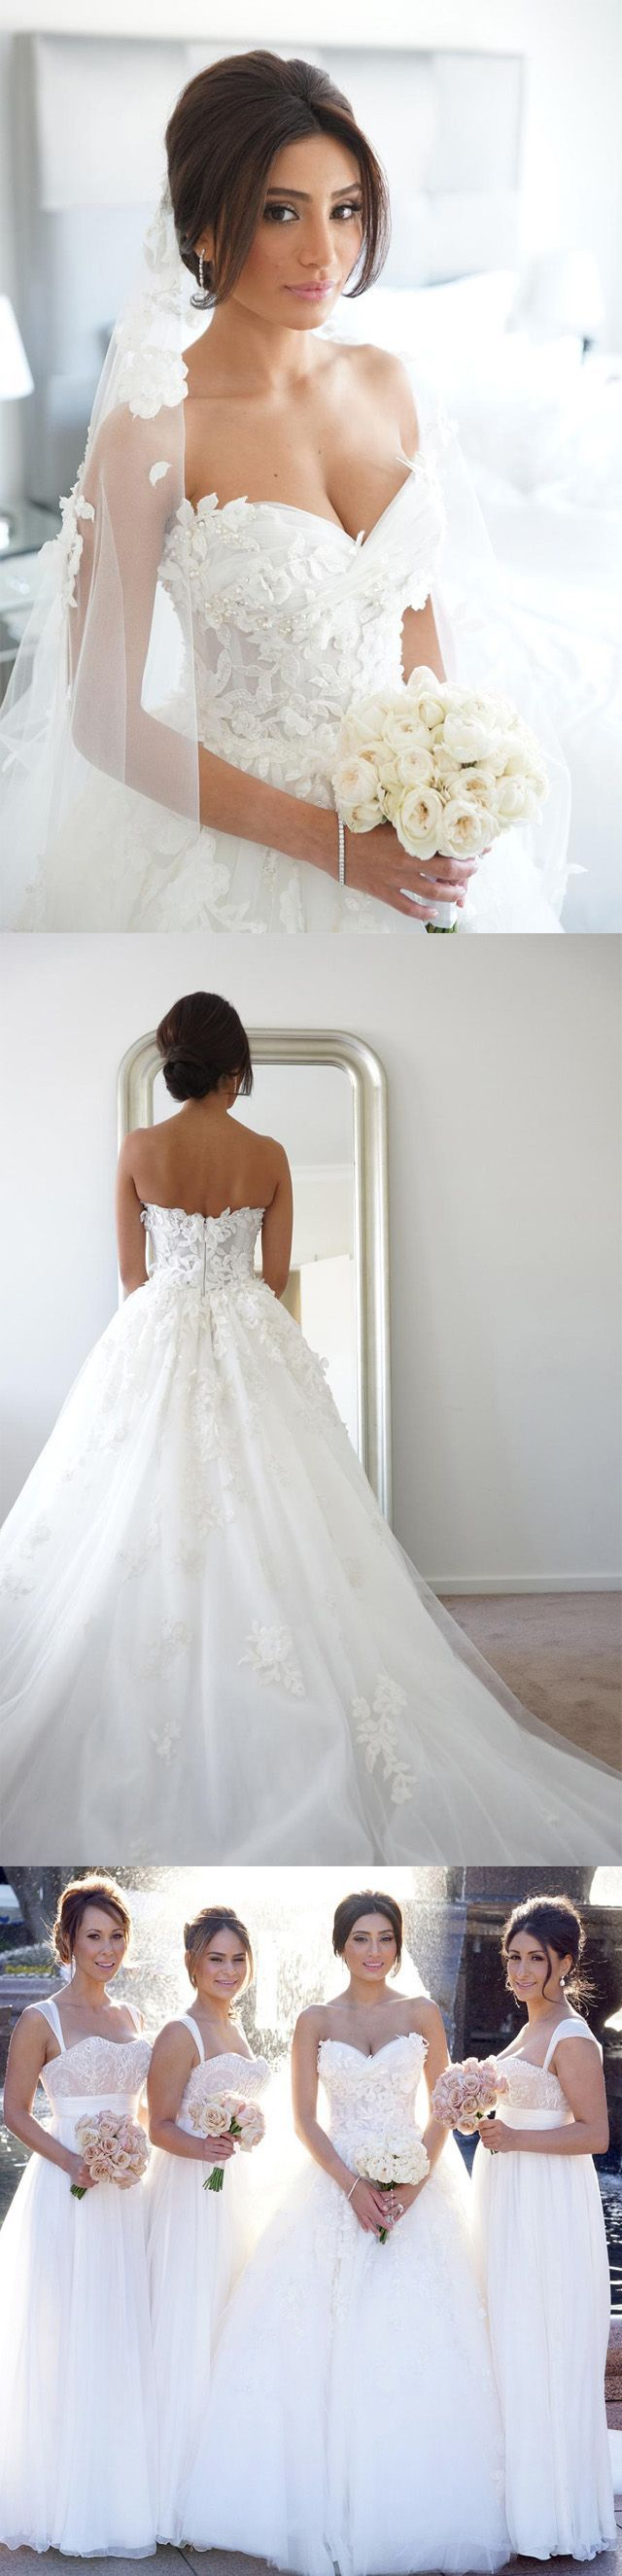 Ball Gown Bridal Wedding Dress